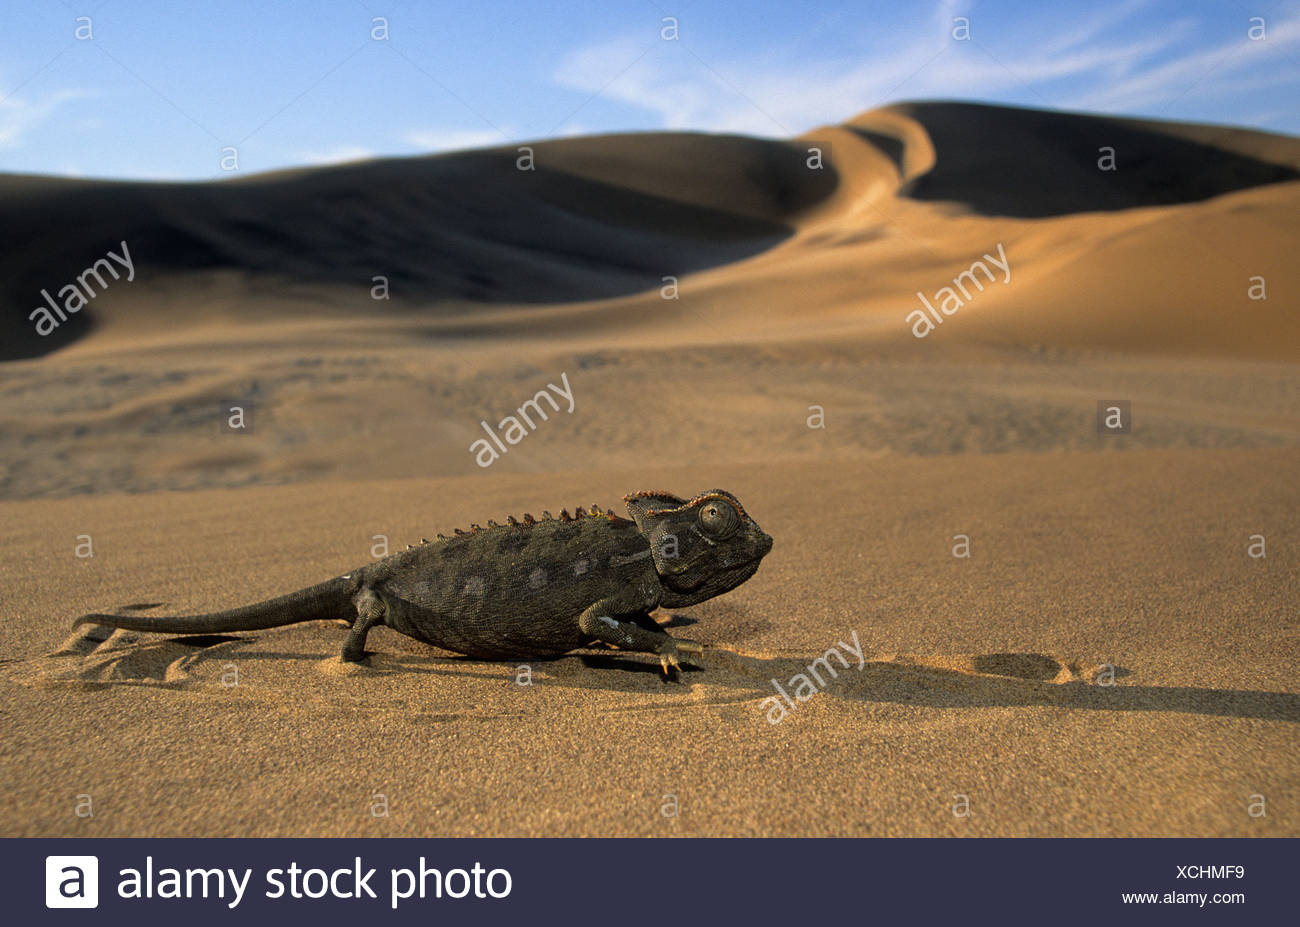 Namaqua Chamaeleon (Chamaeleo namaquensis), in the desert, Namib Desert, Namibia, Africa Stock Photo